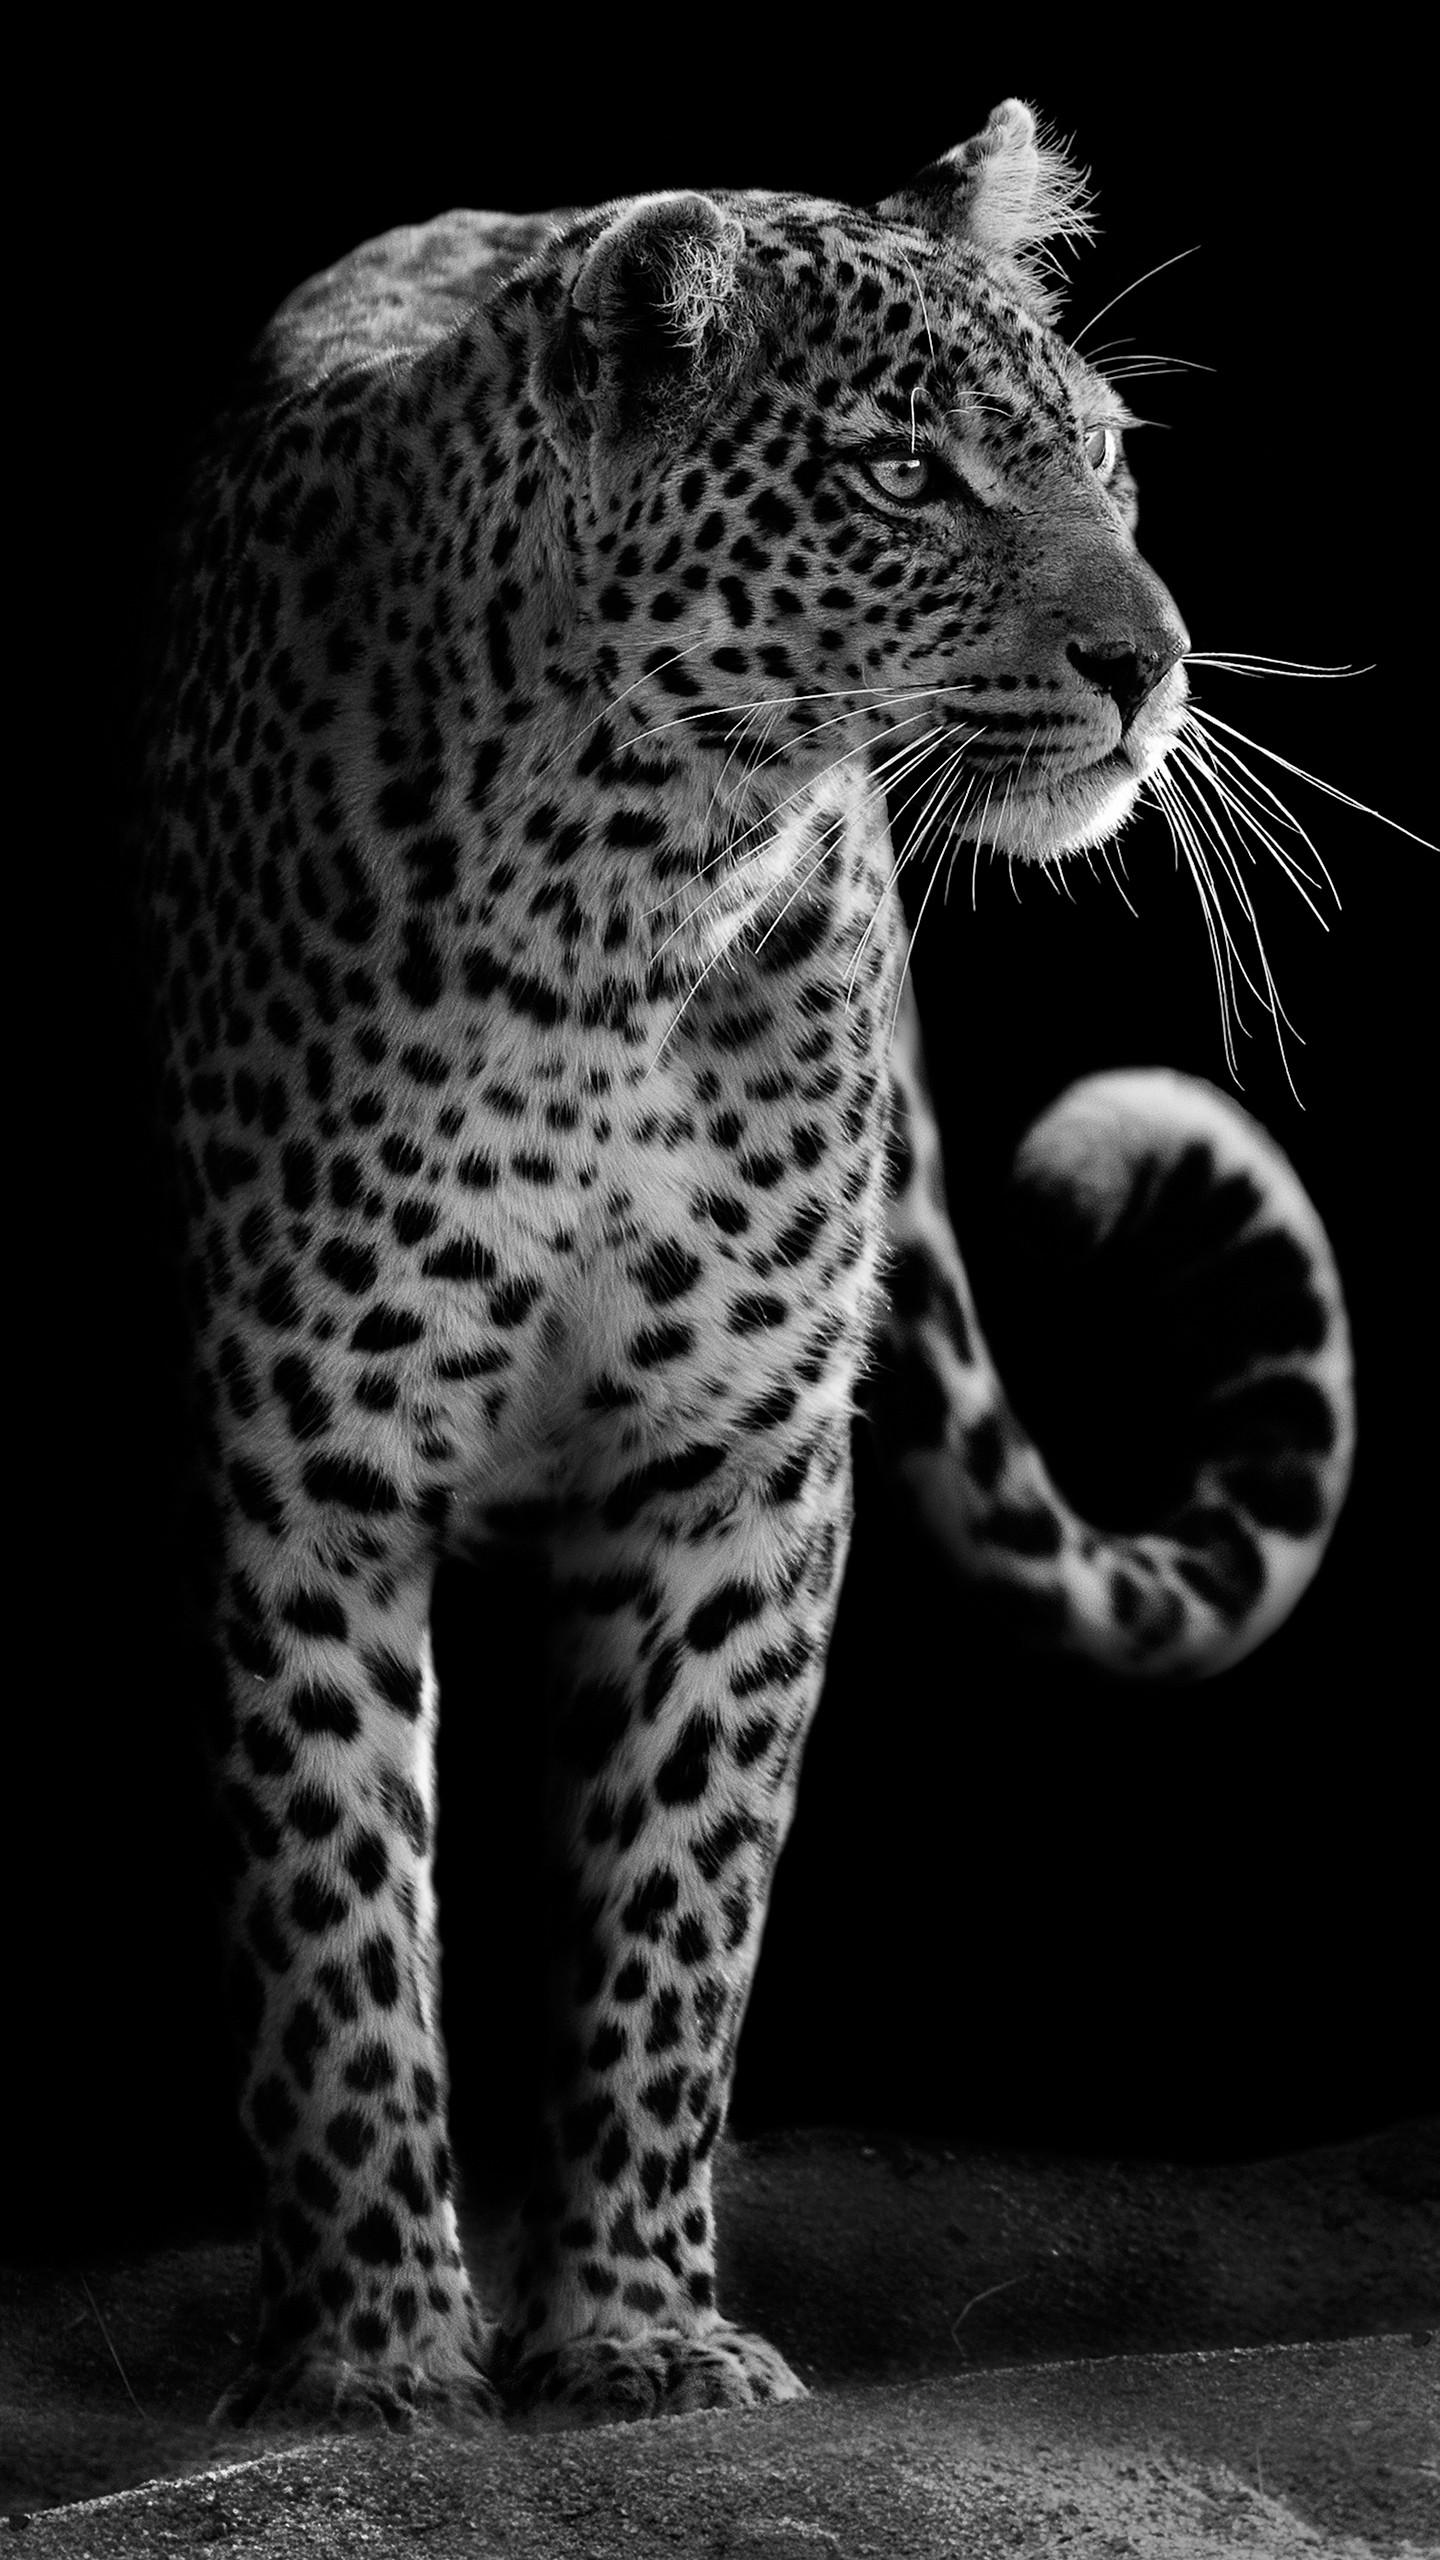 Cheetah Wallpaper Hd Leopard Hd 4k Wallpapers Hd Wallpapers Id 21614